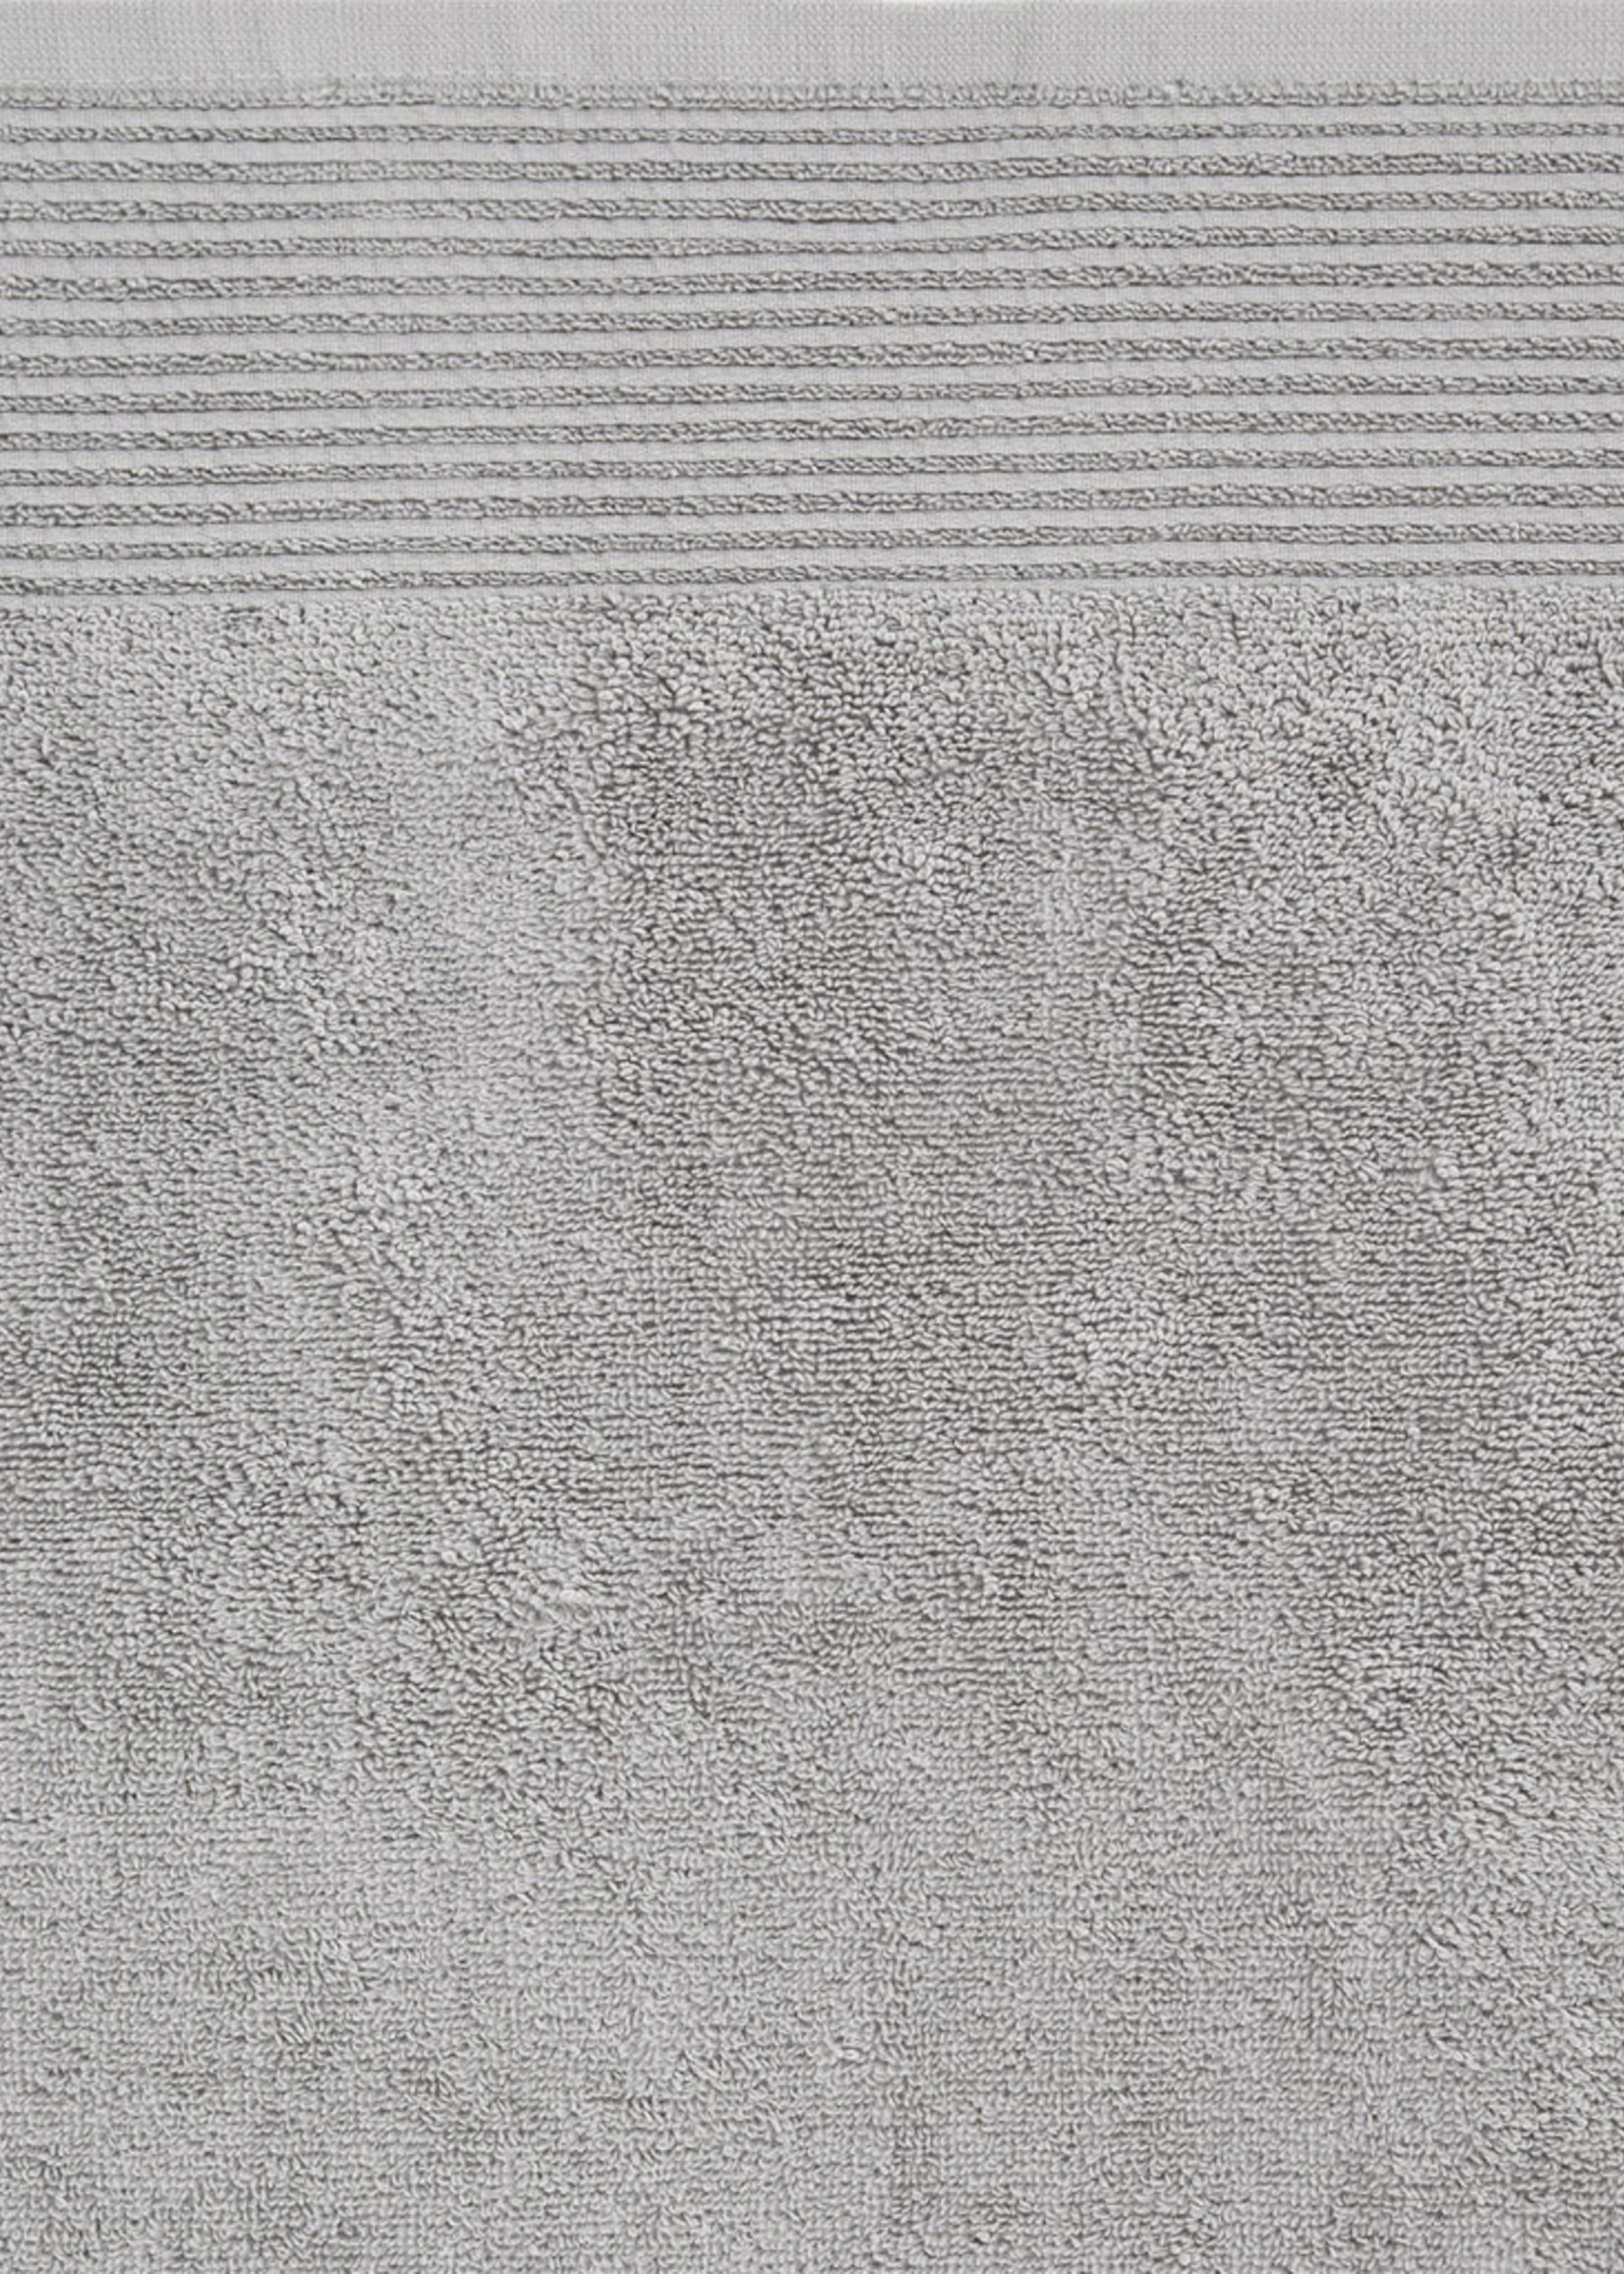 Linen House Linen House Bath Towel Riba - Silver